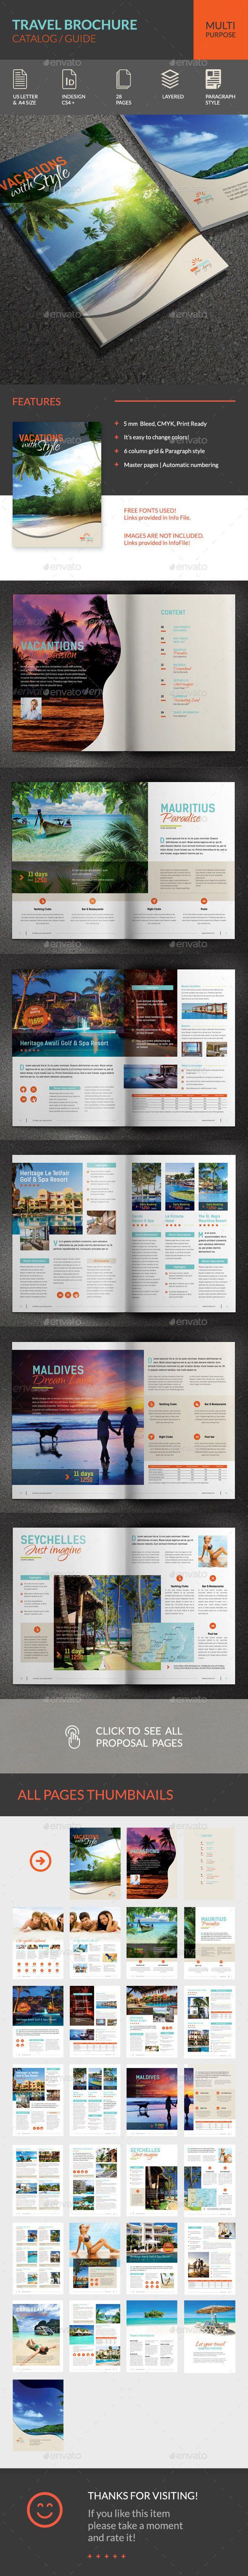 Travel Brochure Template InDesign INDD. Download here: http://graphicriver.net/item/travel-brochure/14848974?ref=ksioks